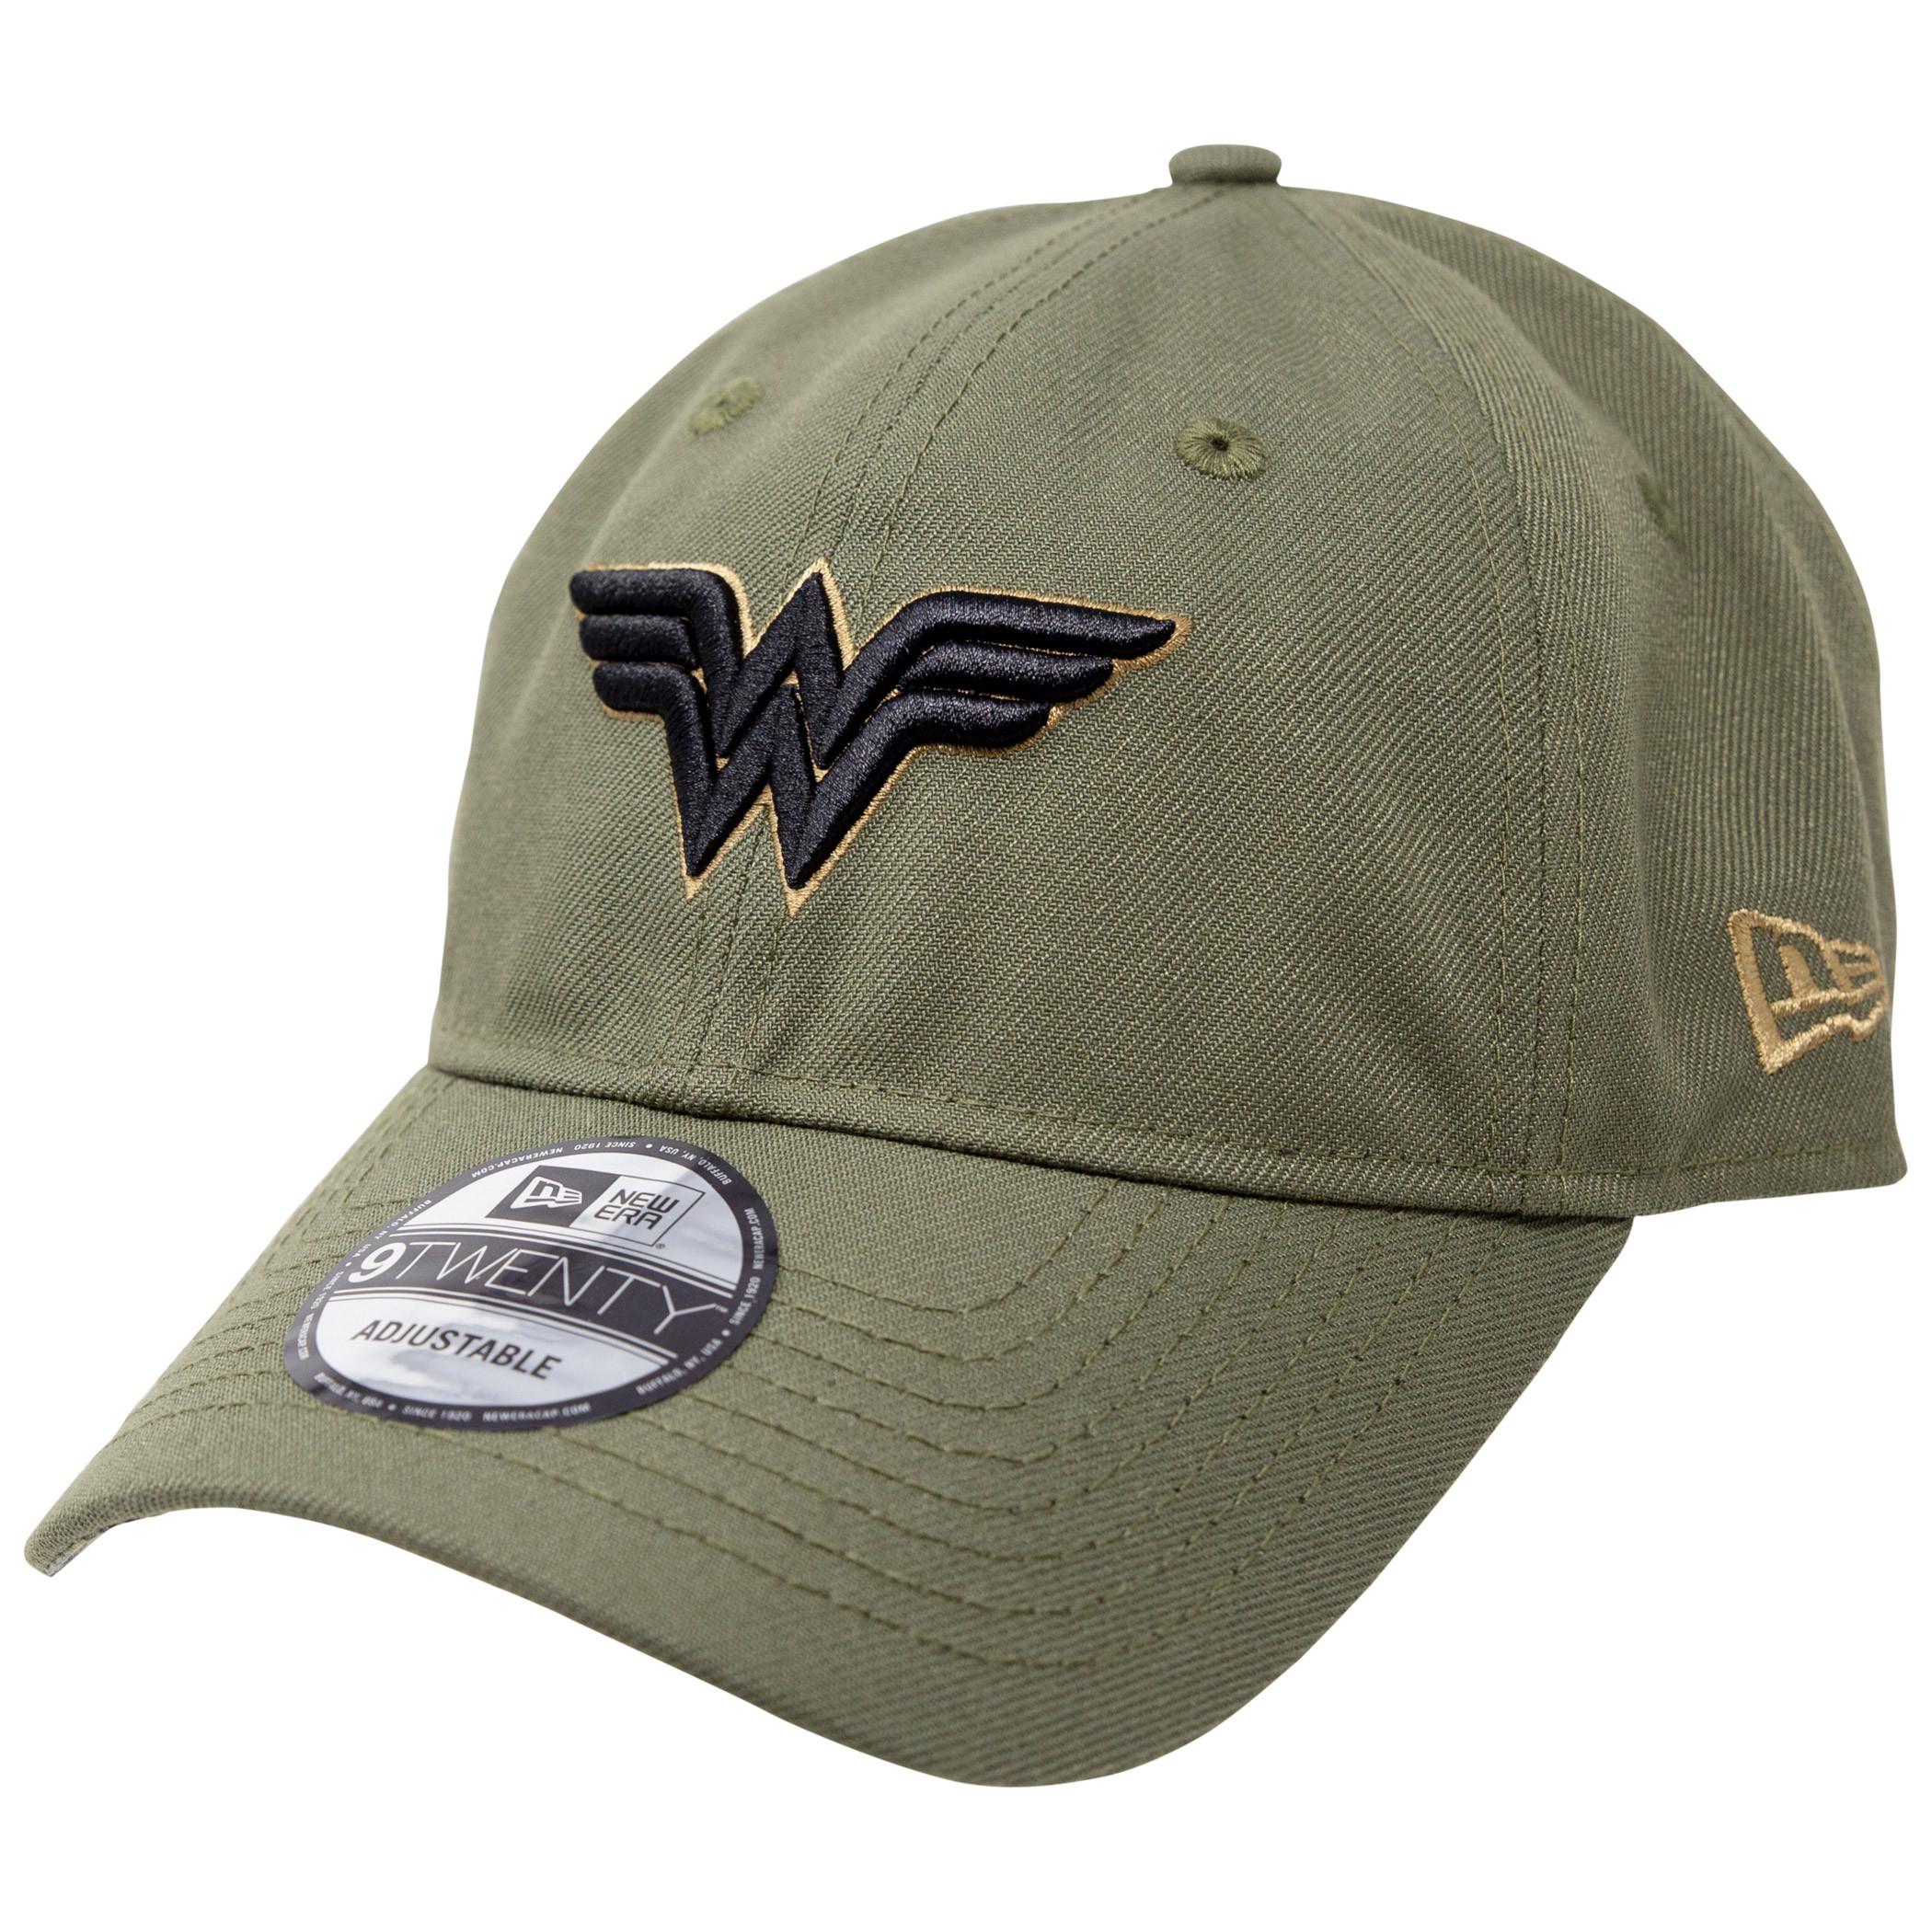 Wonder Woman Salute to Service New Era 9Twenty Adjustable Hat